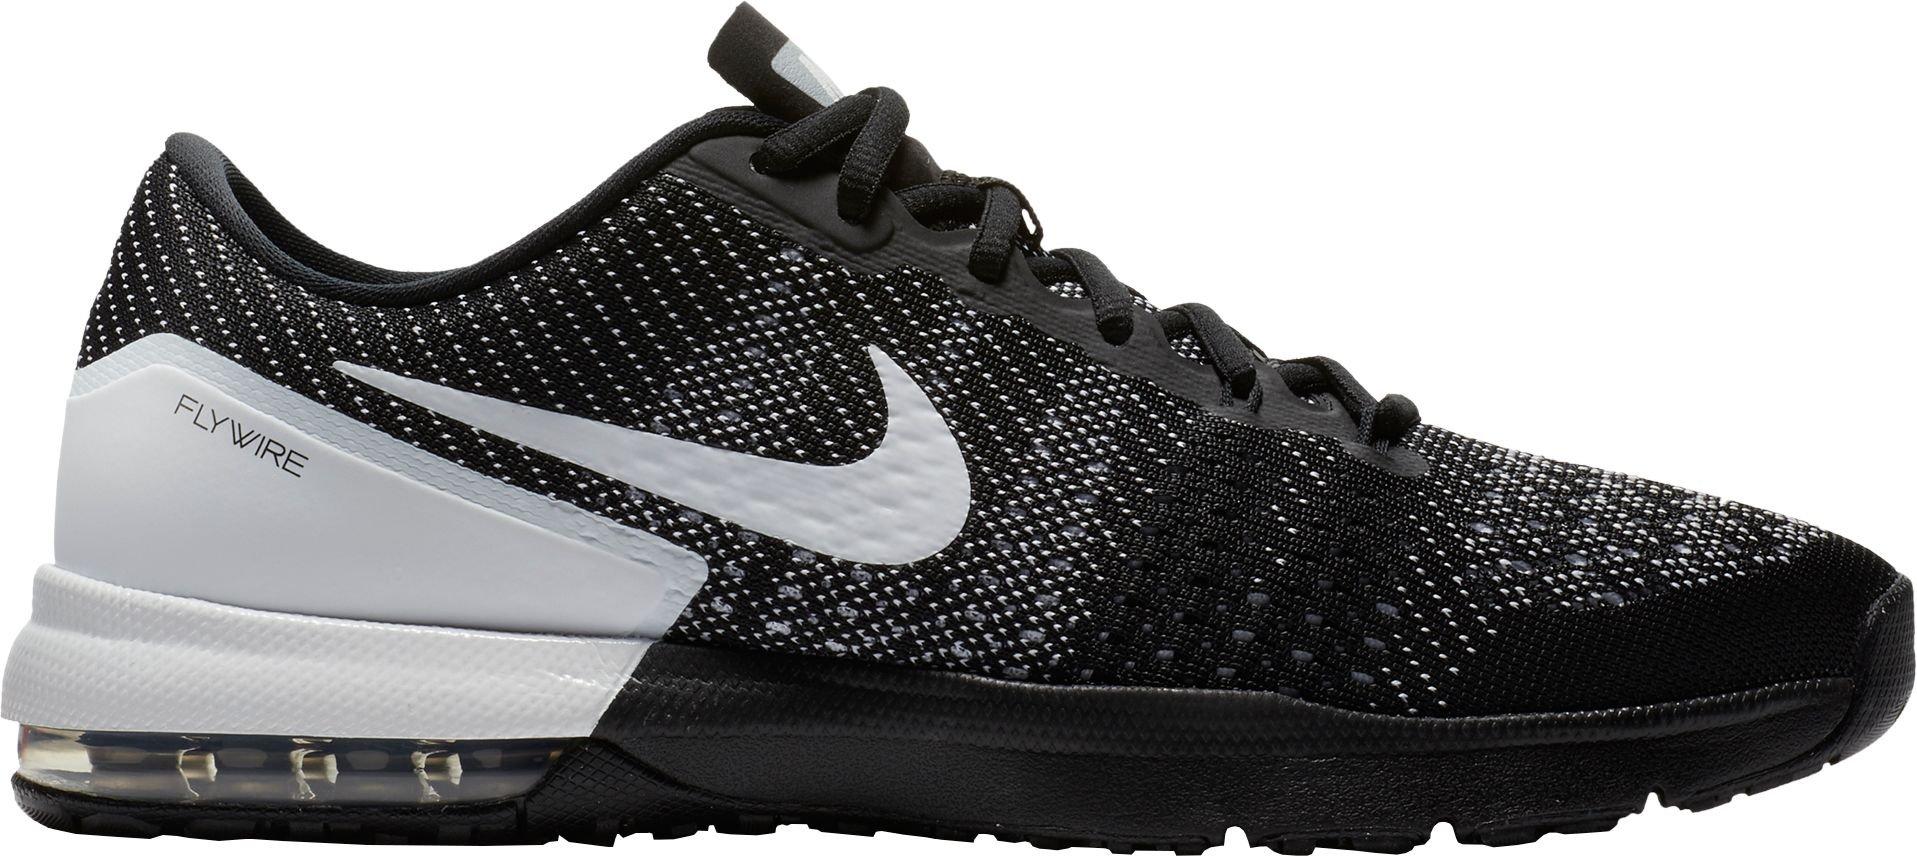 save off a1873 8dbbb Galleon - NIKE Men s Air Max Typha Training Shoes (7.5, Black White White-M)